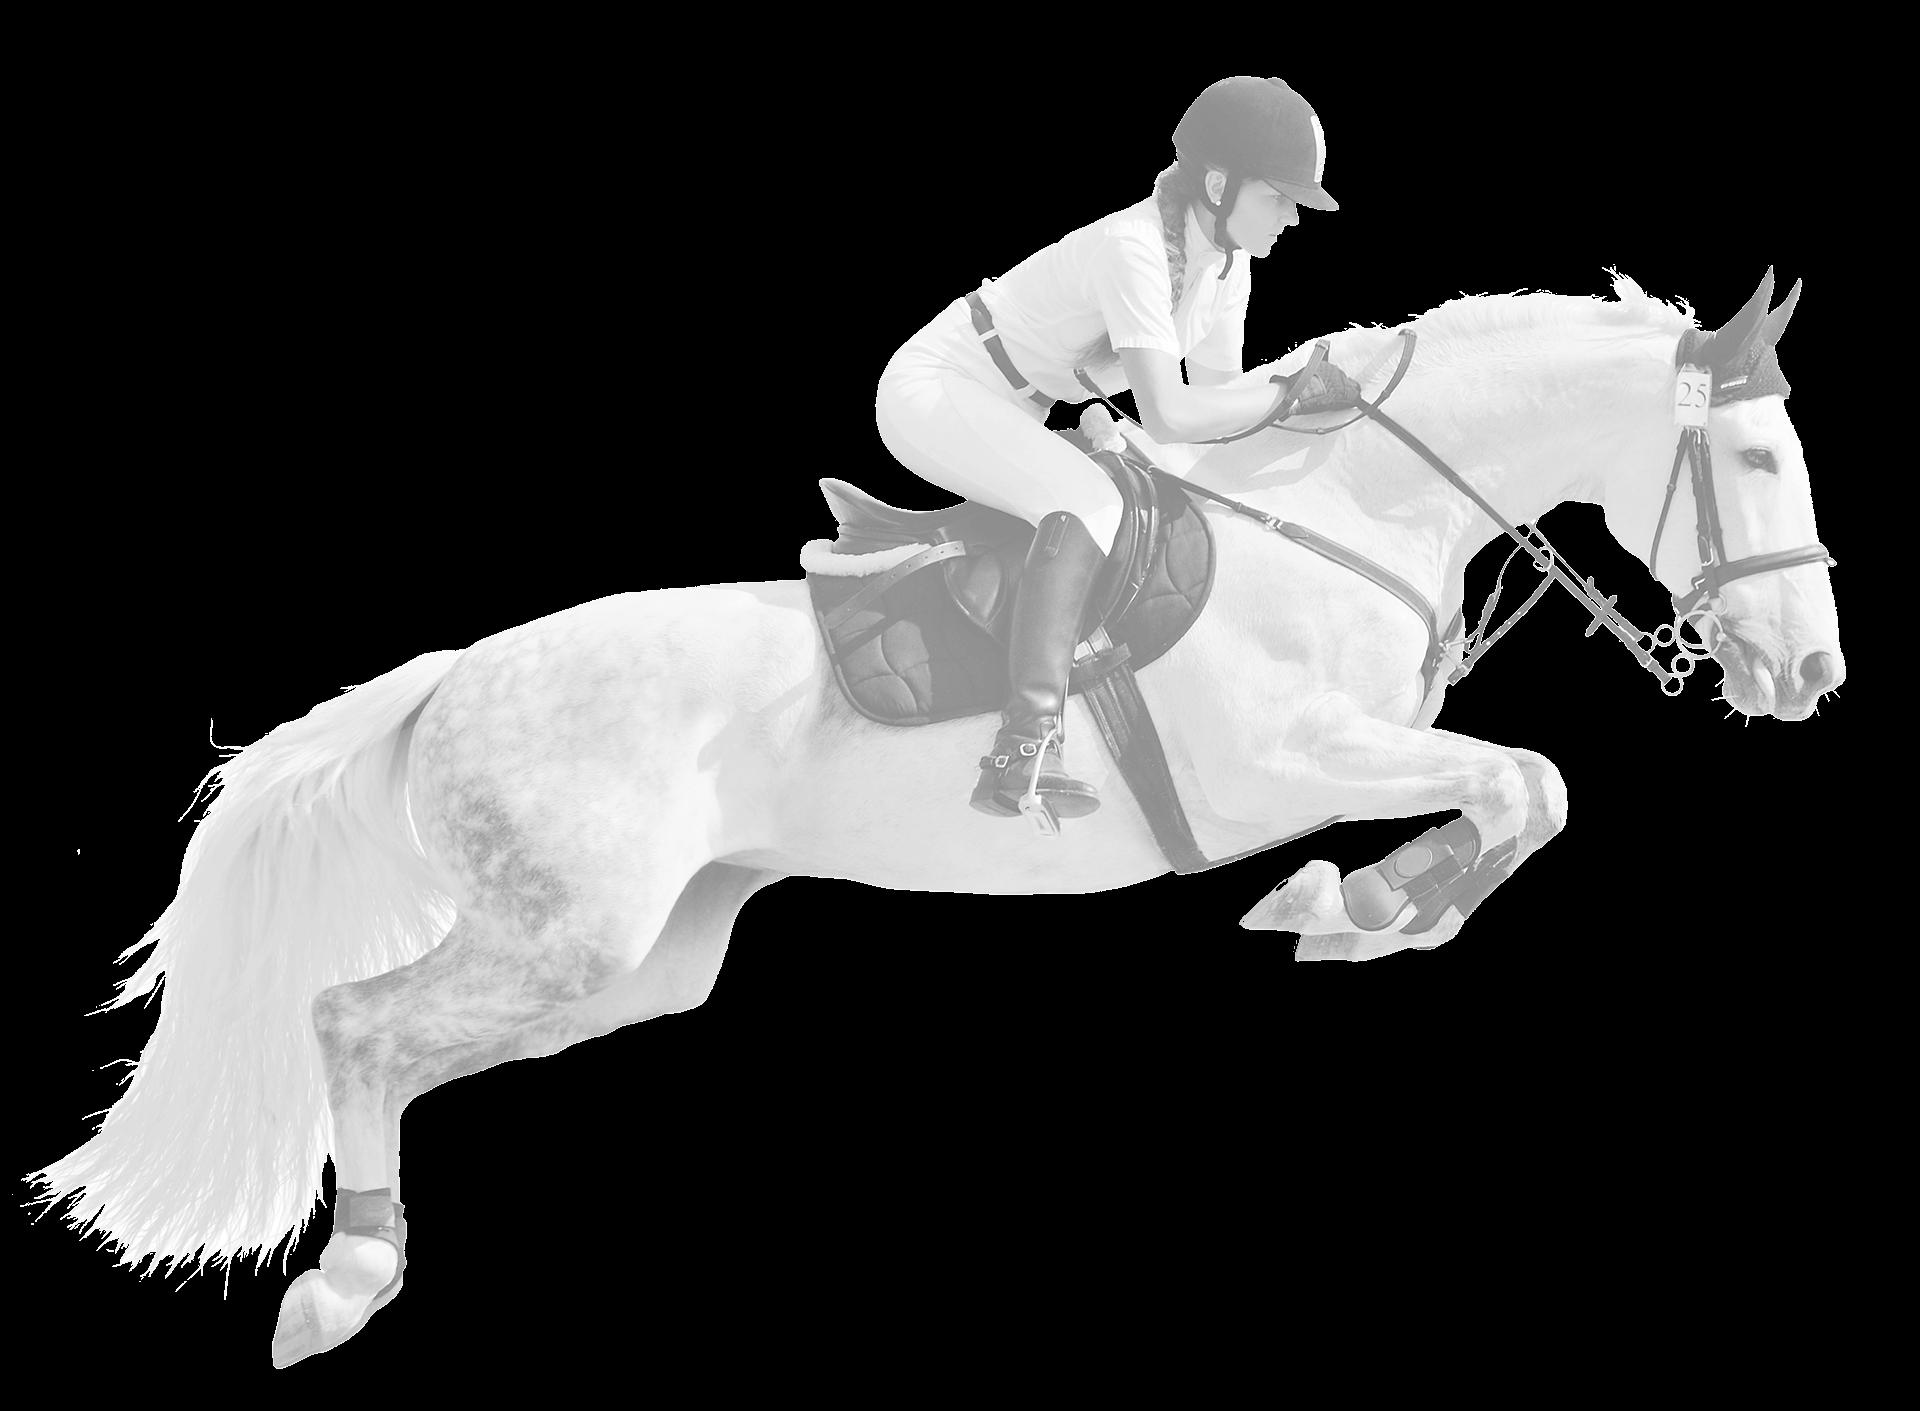 EponaMind - Technology for the Horse